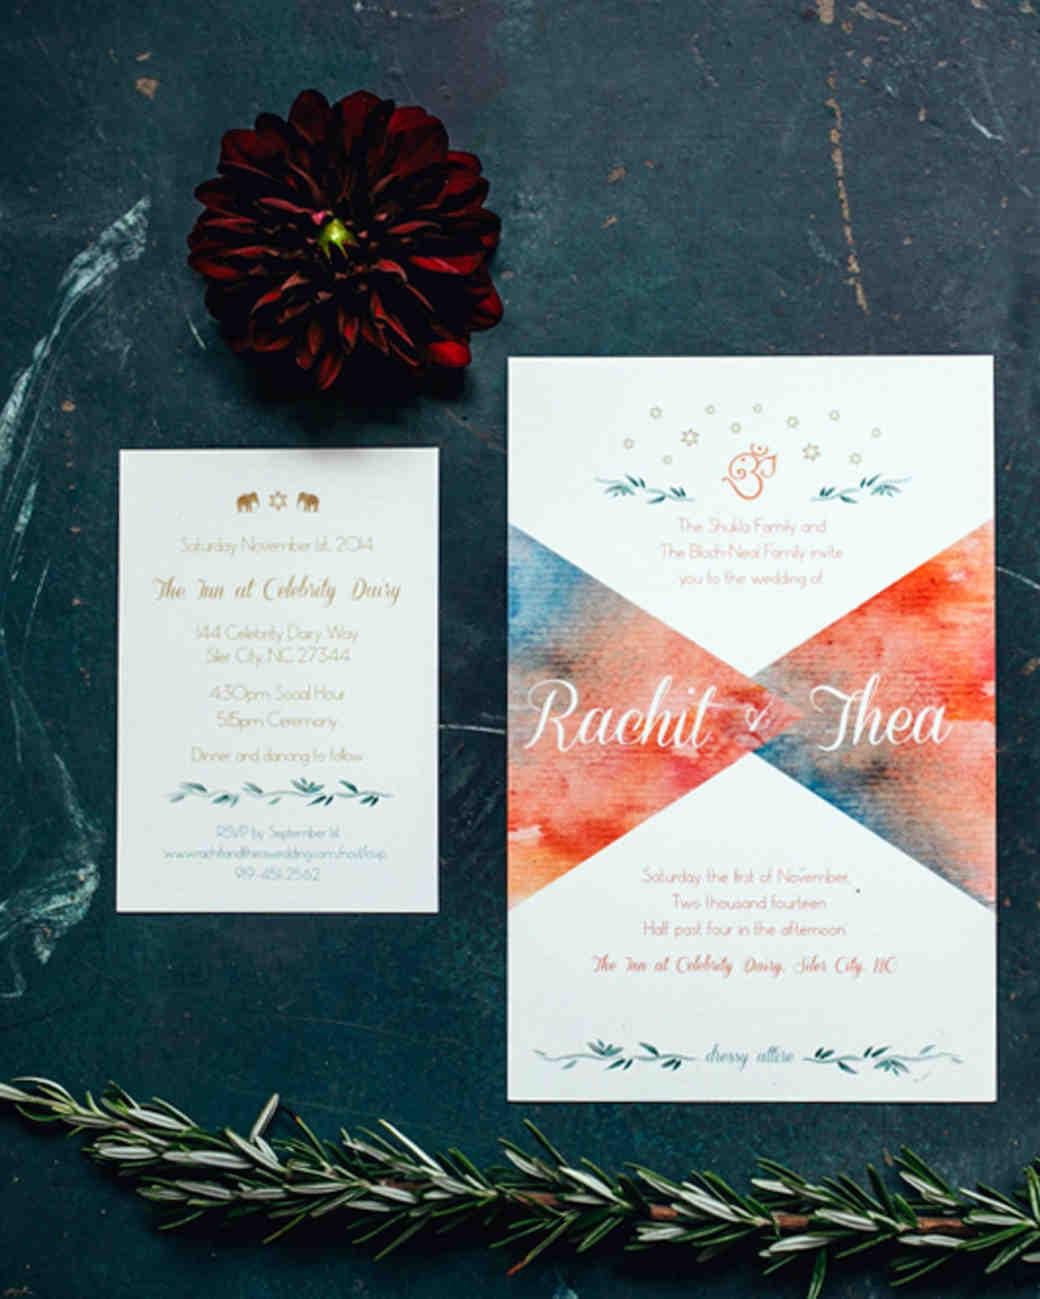 thea-rachit-wedding-invite-0015-s112016-0715.jpg